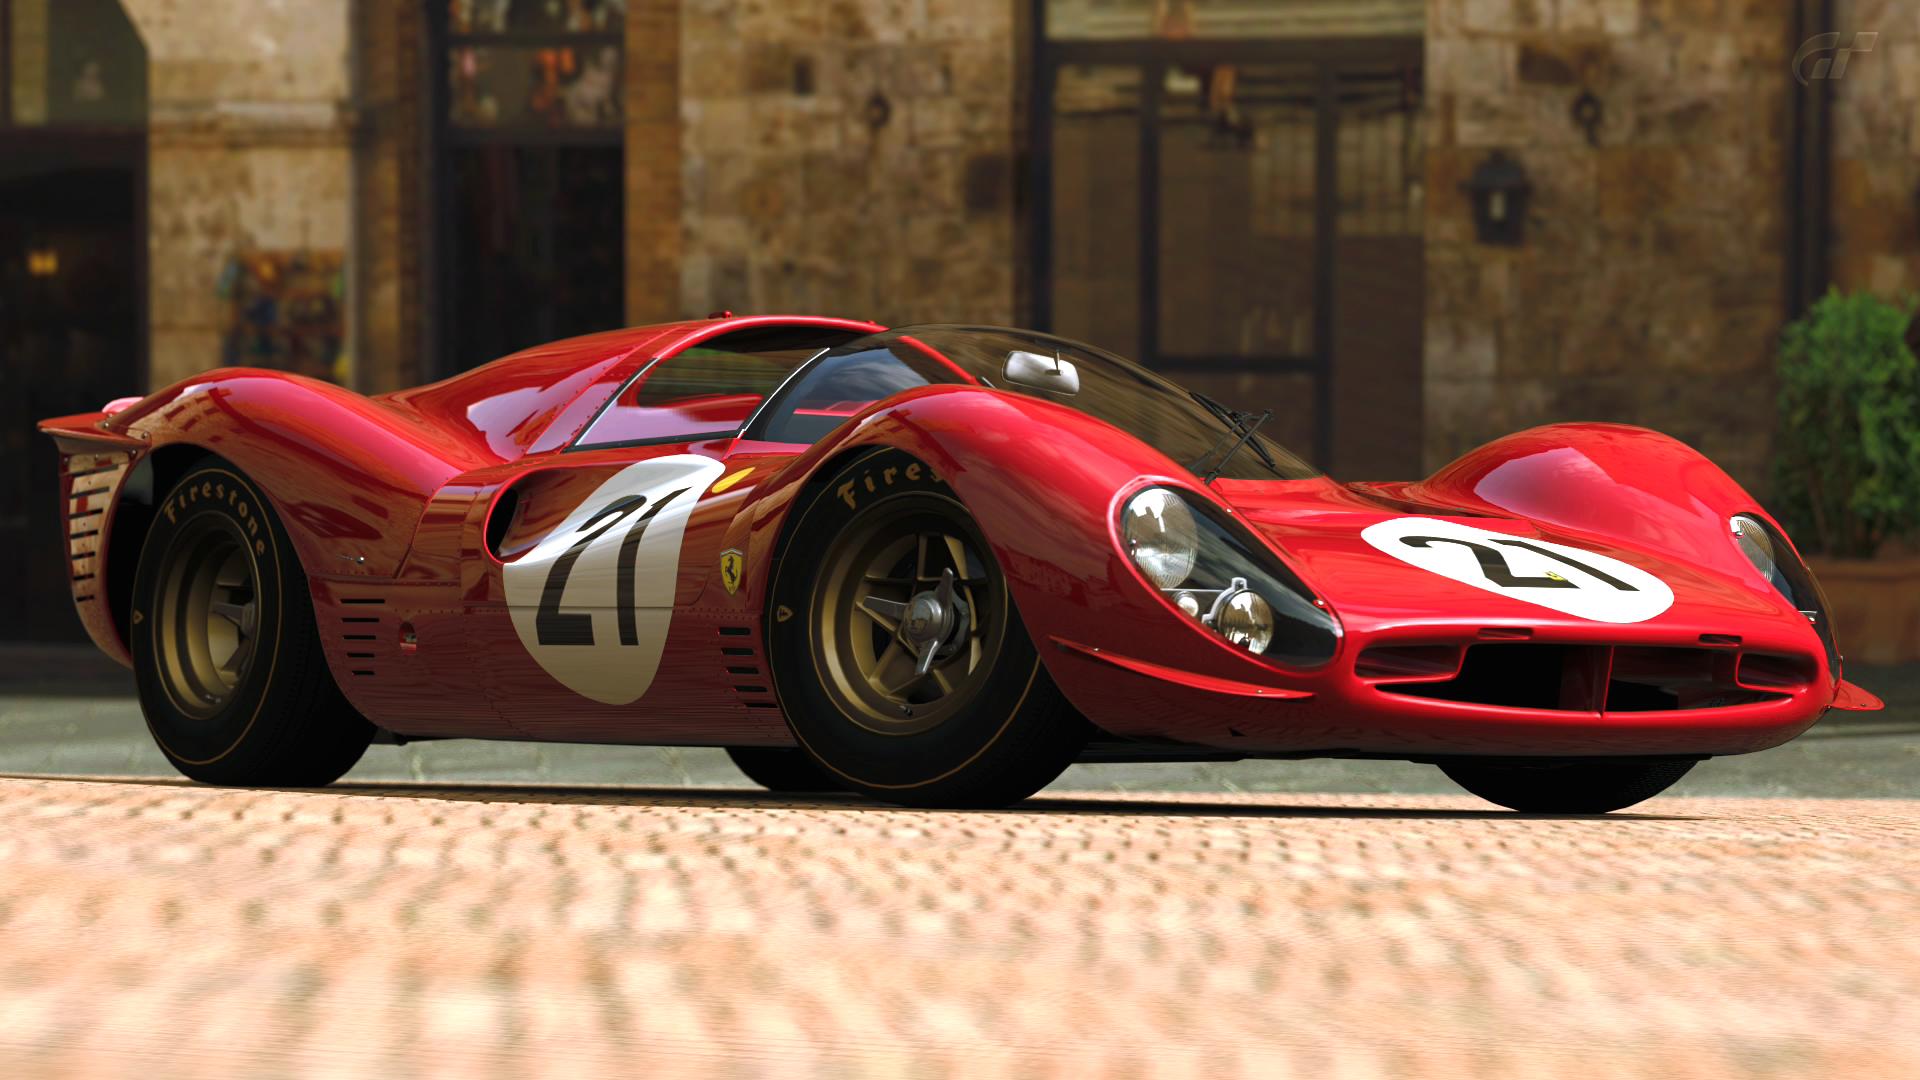 1967_ferrari_330_p4__gran_turi-54a7925c9b680 Remarkable Lotus Carlton Gran Turismo 5 Cars Trend